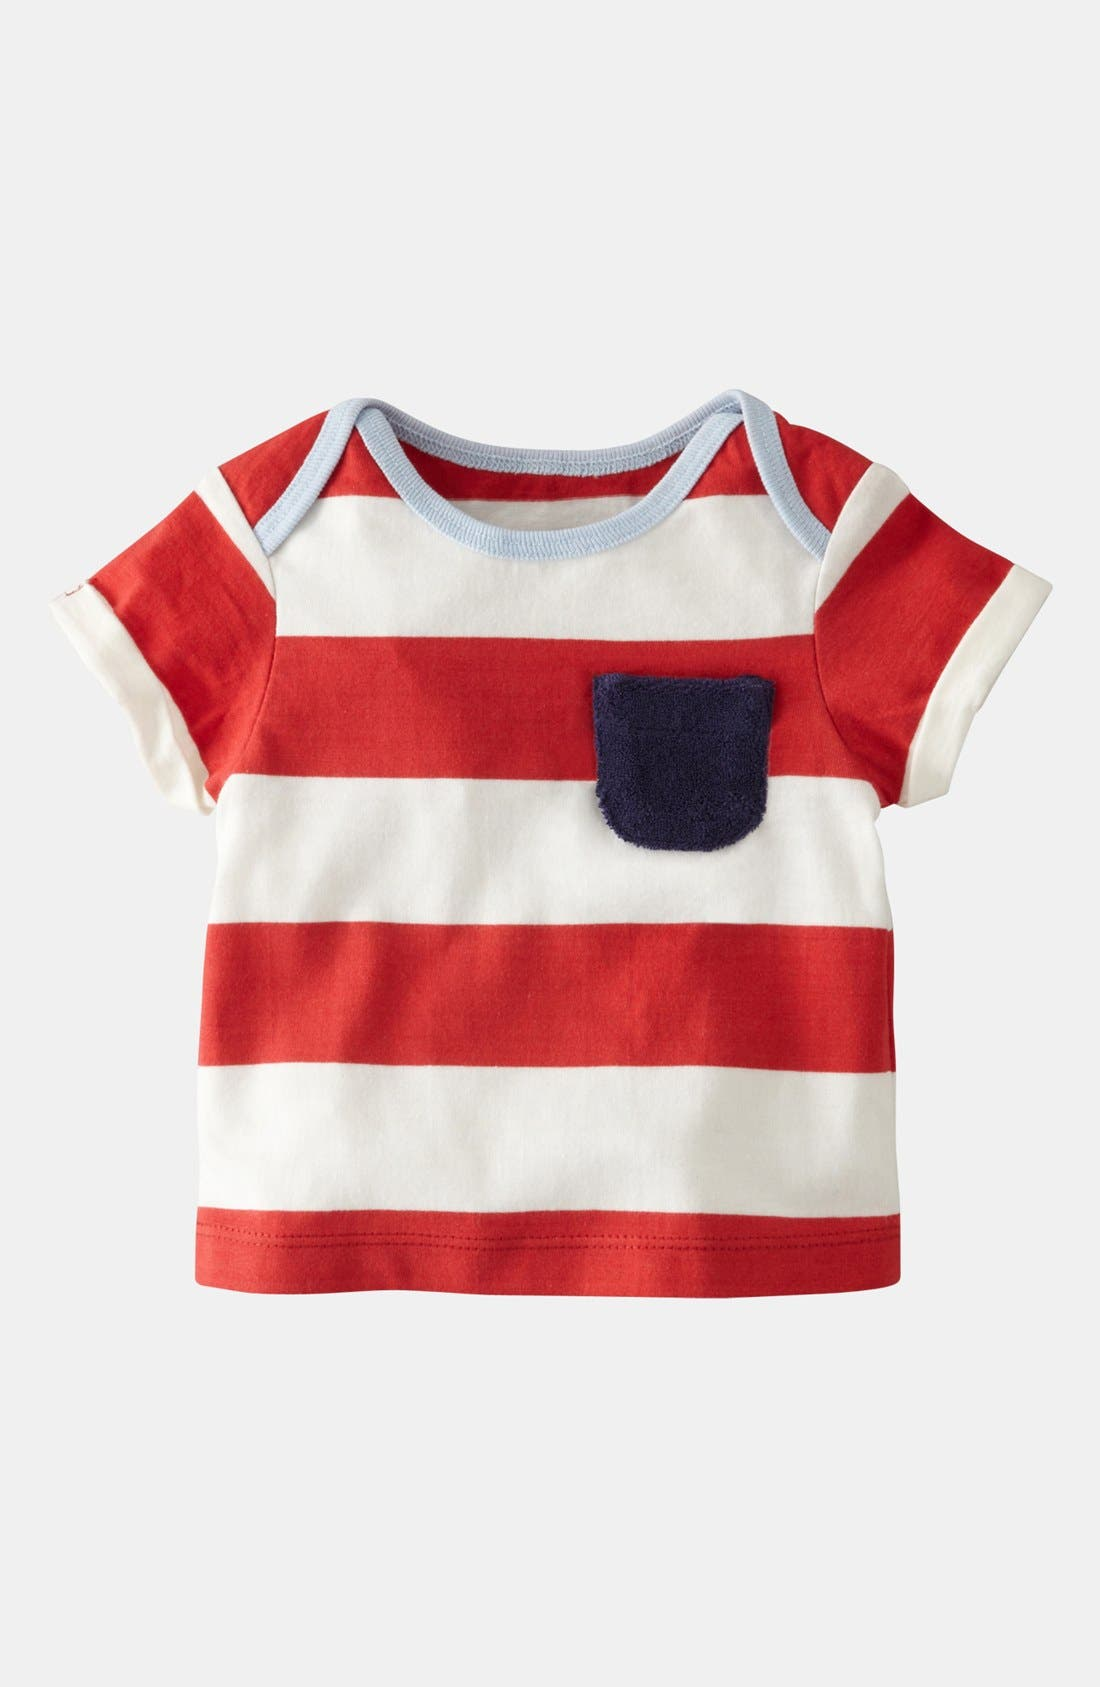 Main Image - Mini Boden 'Stripy Summer' T-Shirt (Infant)